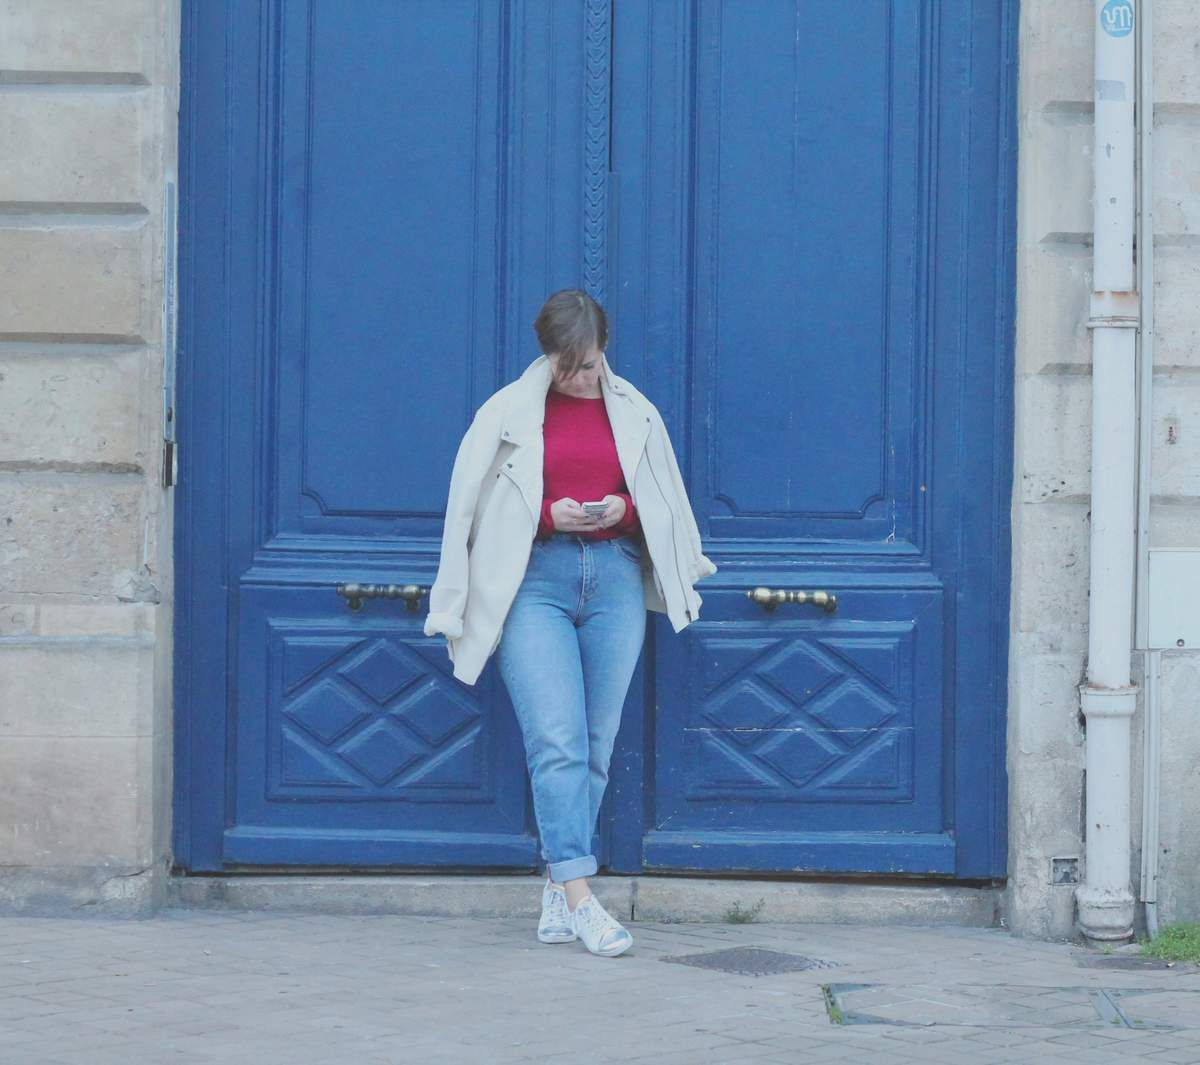 Vive la France Bleu Blanc Rouge